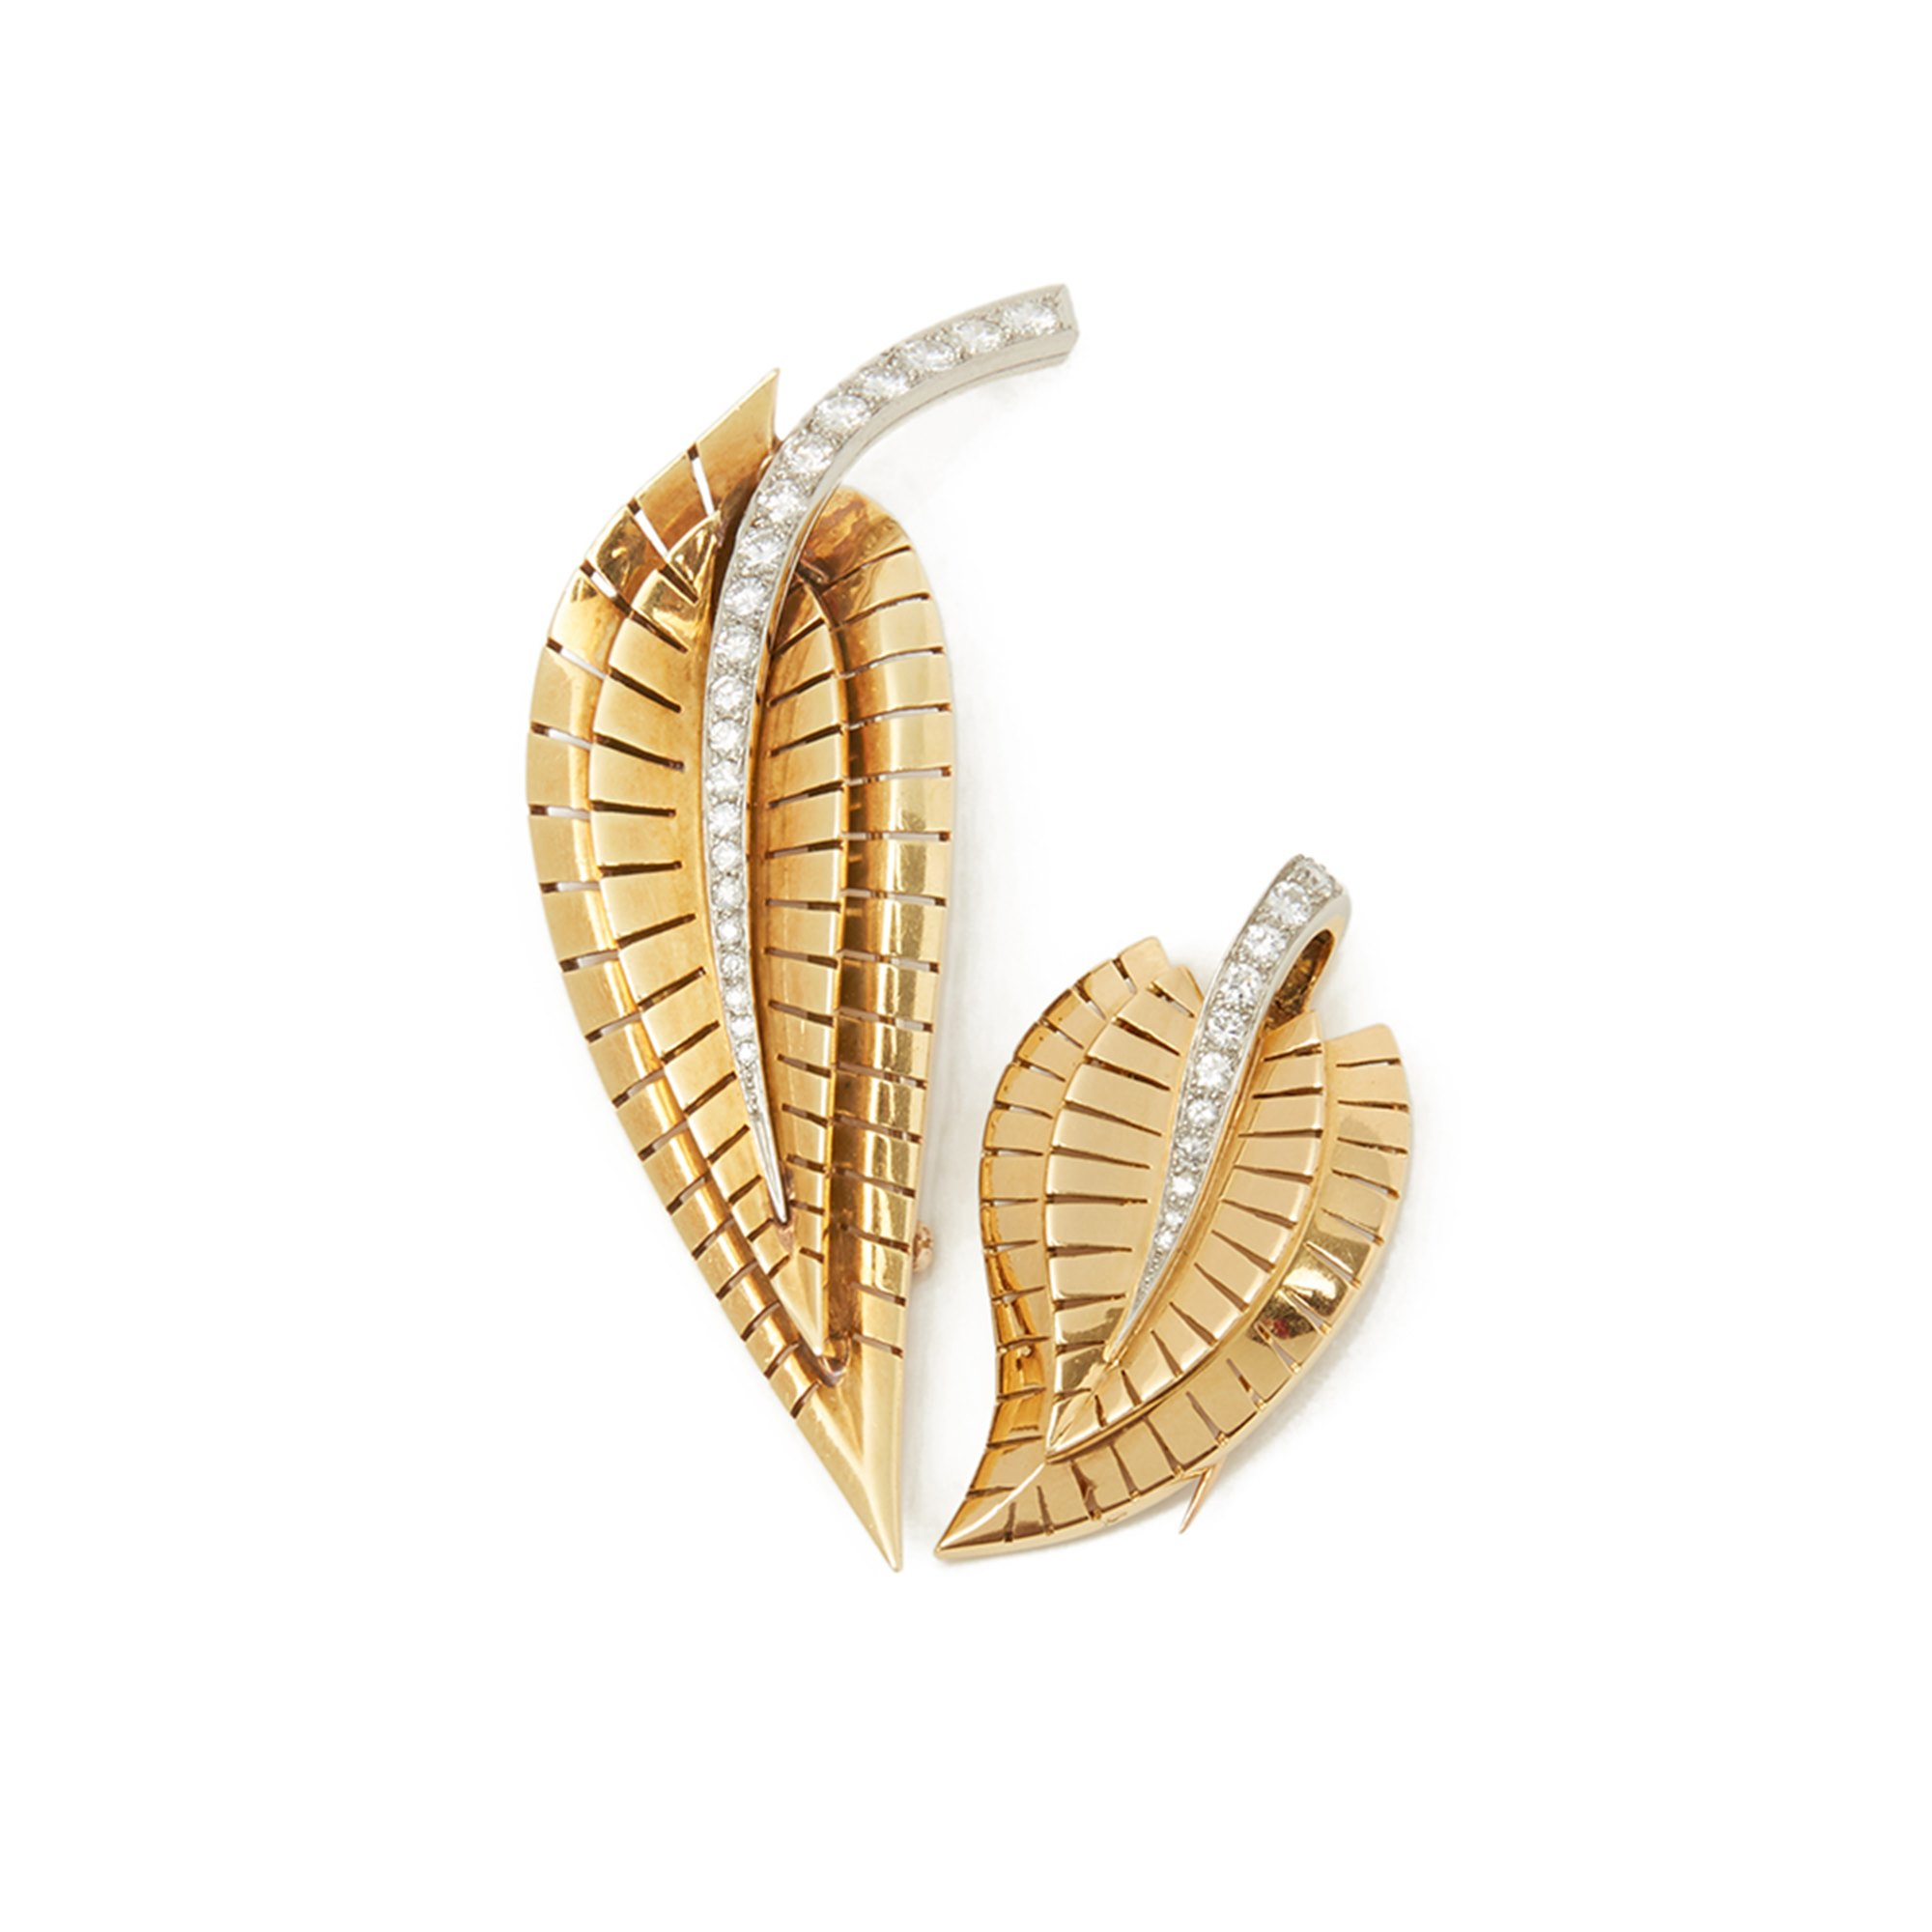 18k-Yellow-Gold-Diamond-Vintage-Brooches-Van-Cleef-Arpels